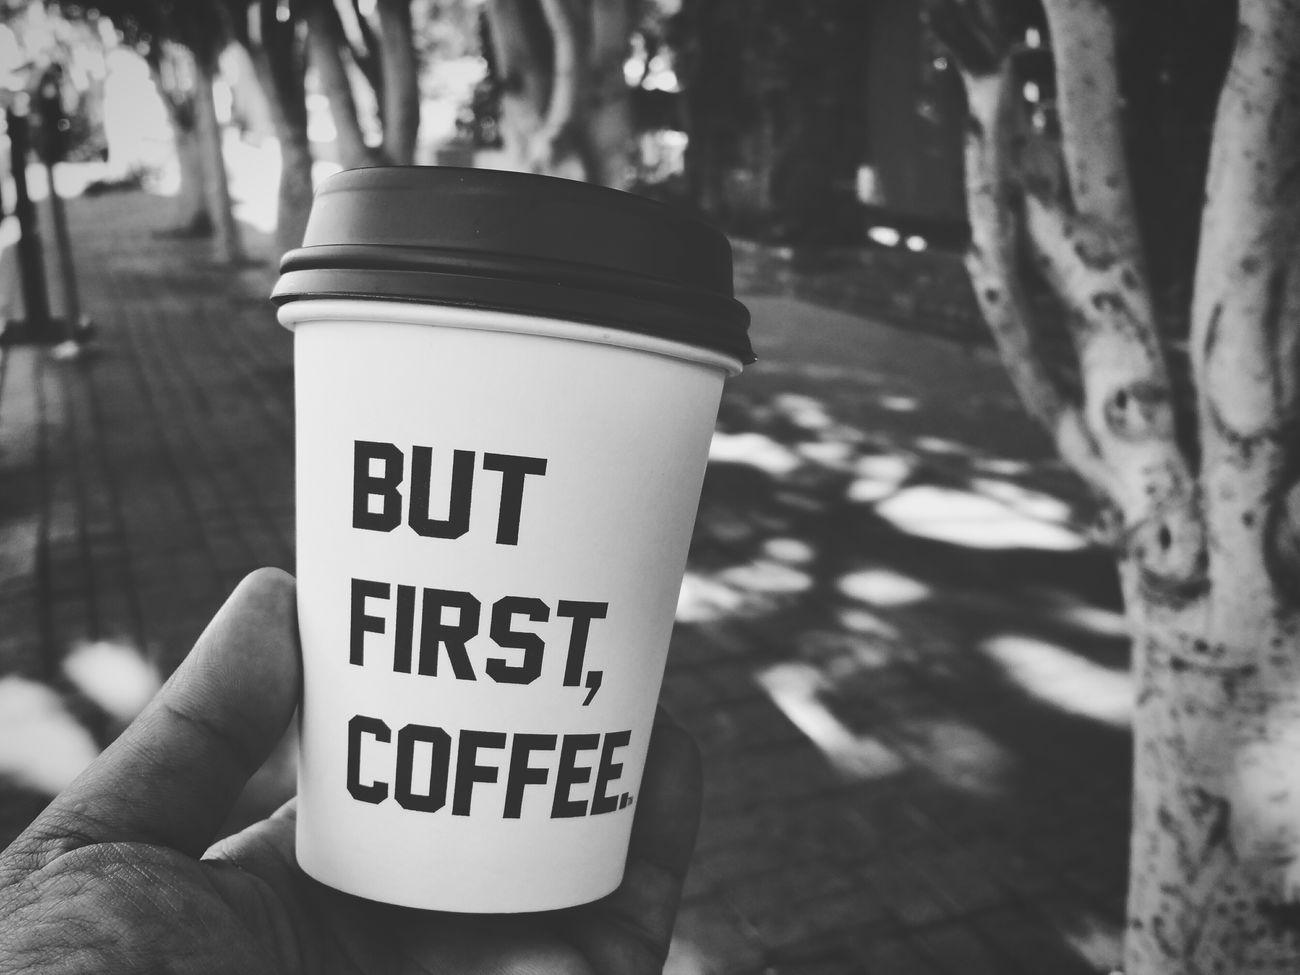 Things I Like Coffee Breaktime Blackandwhite Monochrome Streetphotography Monochrome Photography